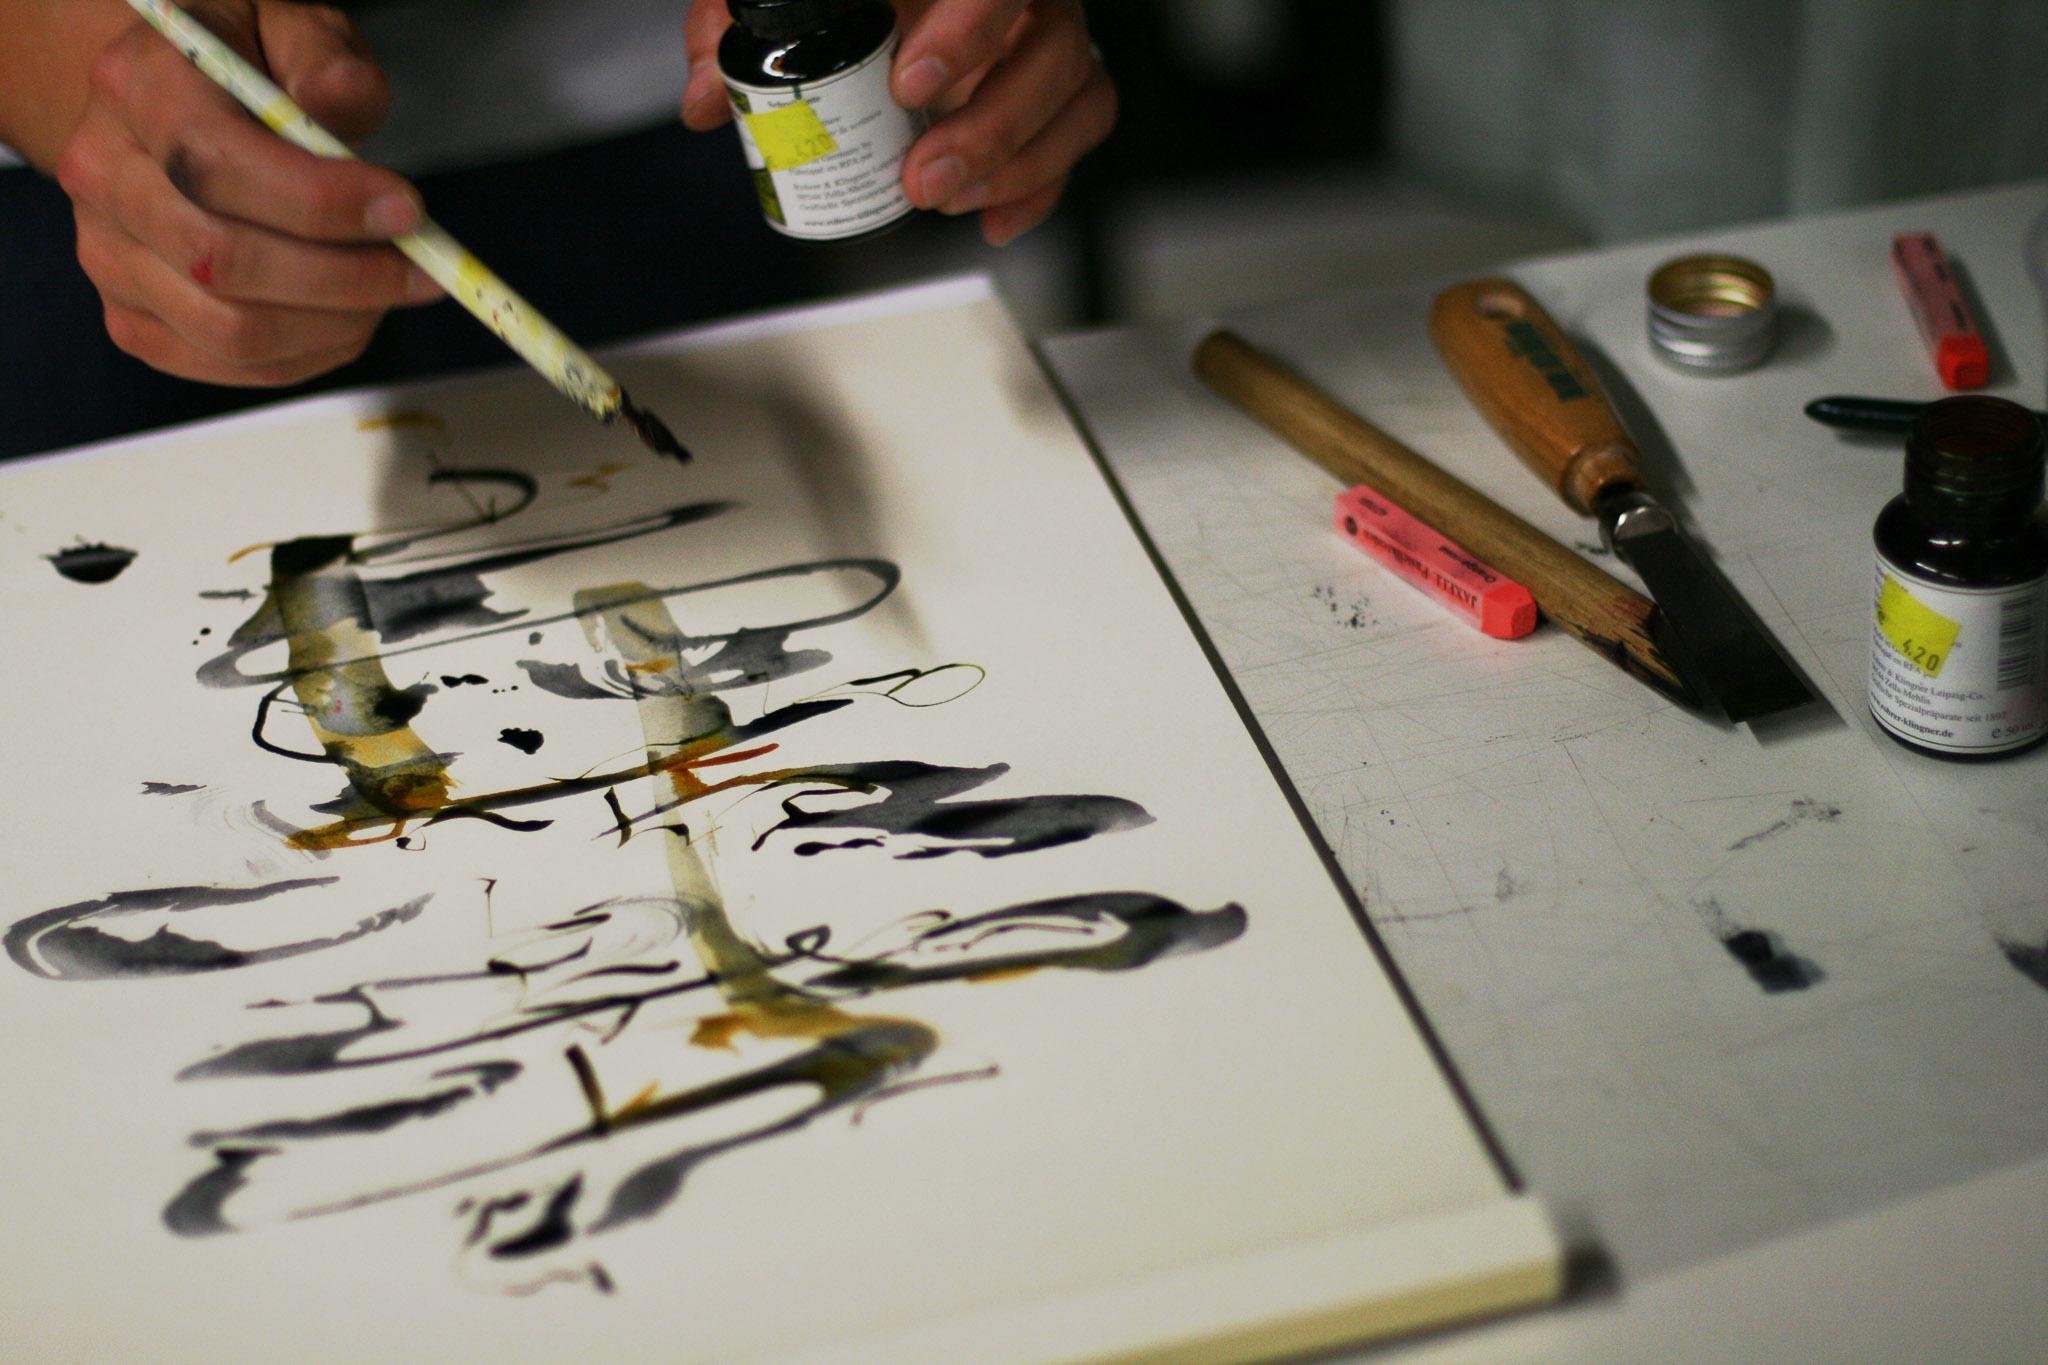 hannah-rauss-workshop-freie-kalligraphie-noe-io03